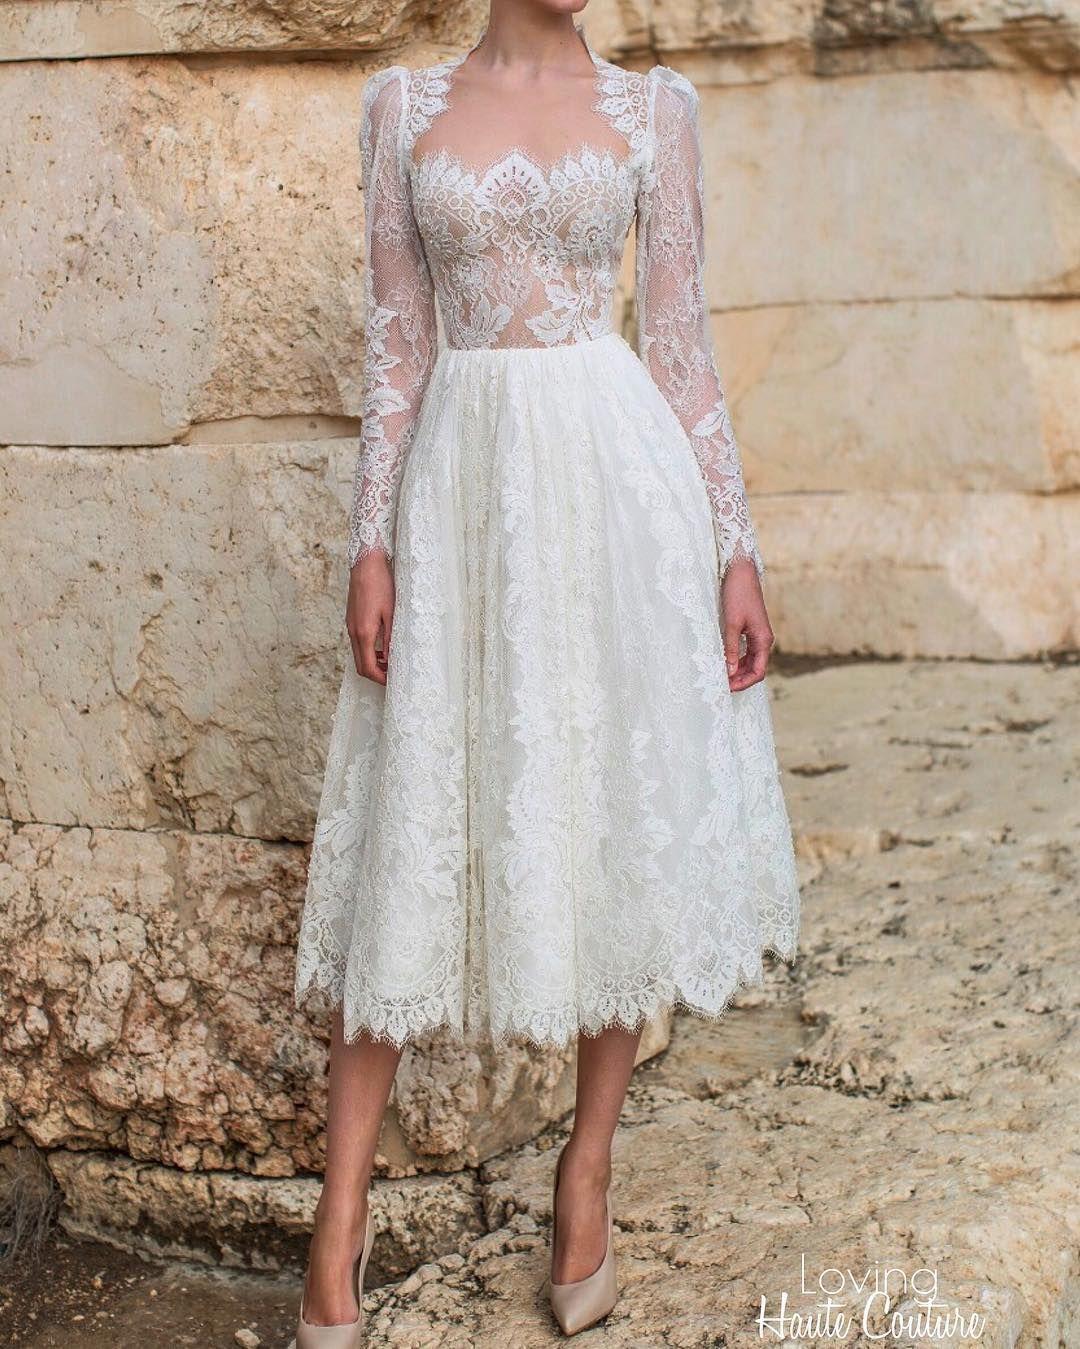 Elegant Long Sleeve Tea Length Wedding Dresses Simple: 2016 Full Lace Tea Length Wedding Dresses Long Sleeves